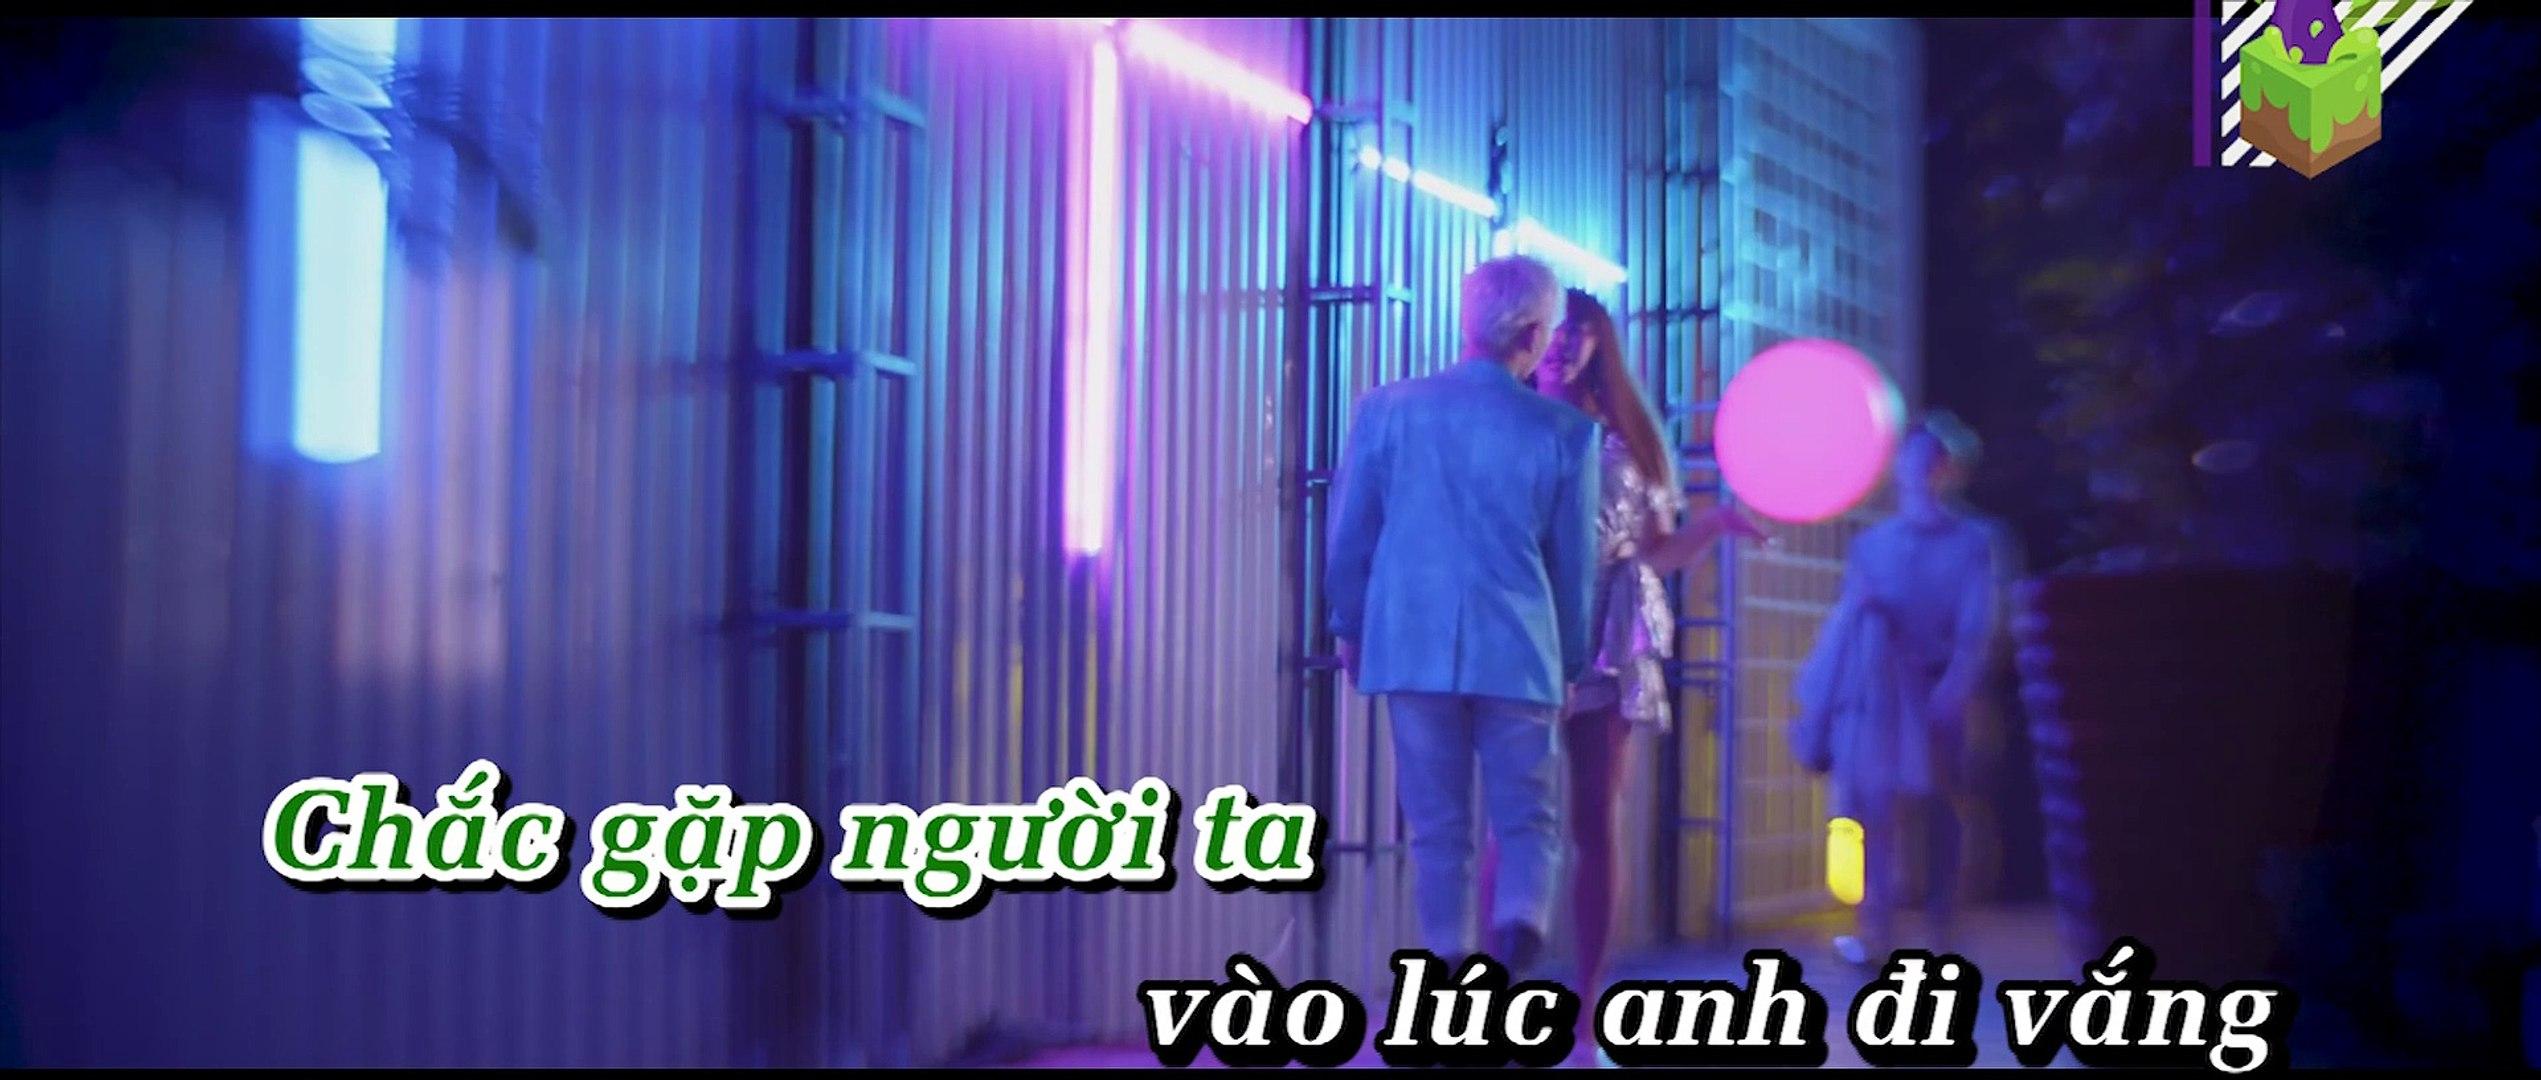 [Karaoke] Anh Ta Là Sao - ERIK ft. OSAD [Beat]